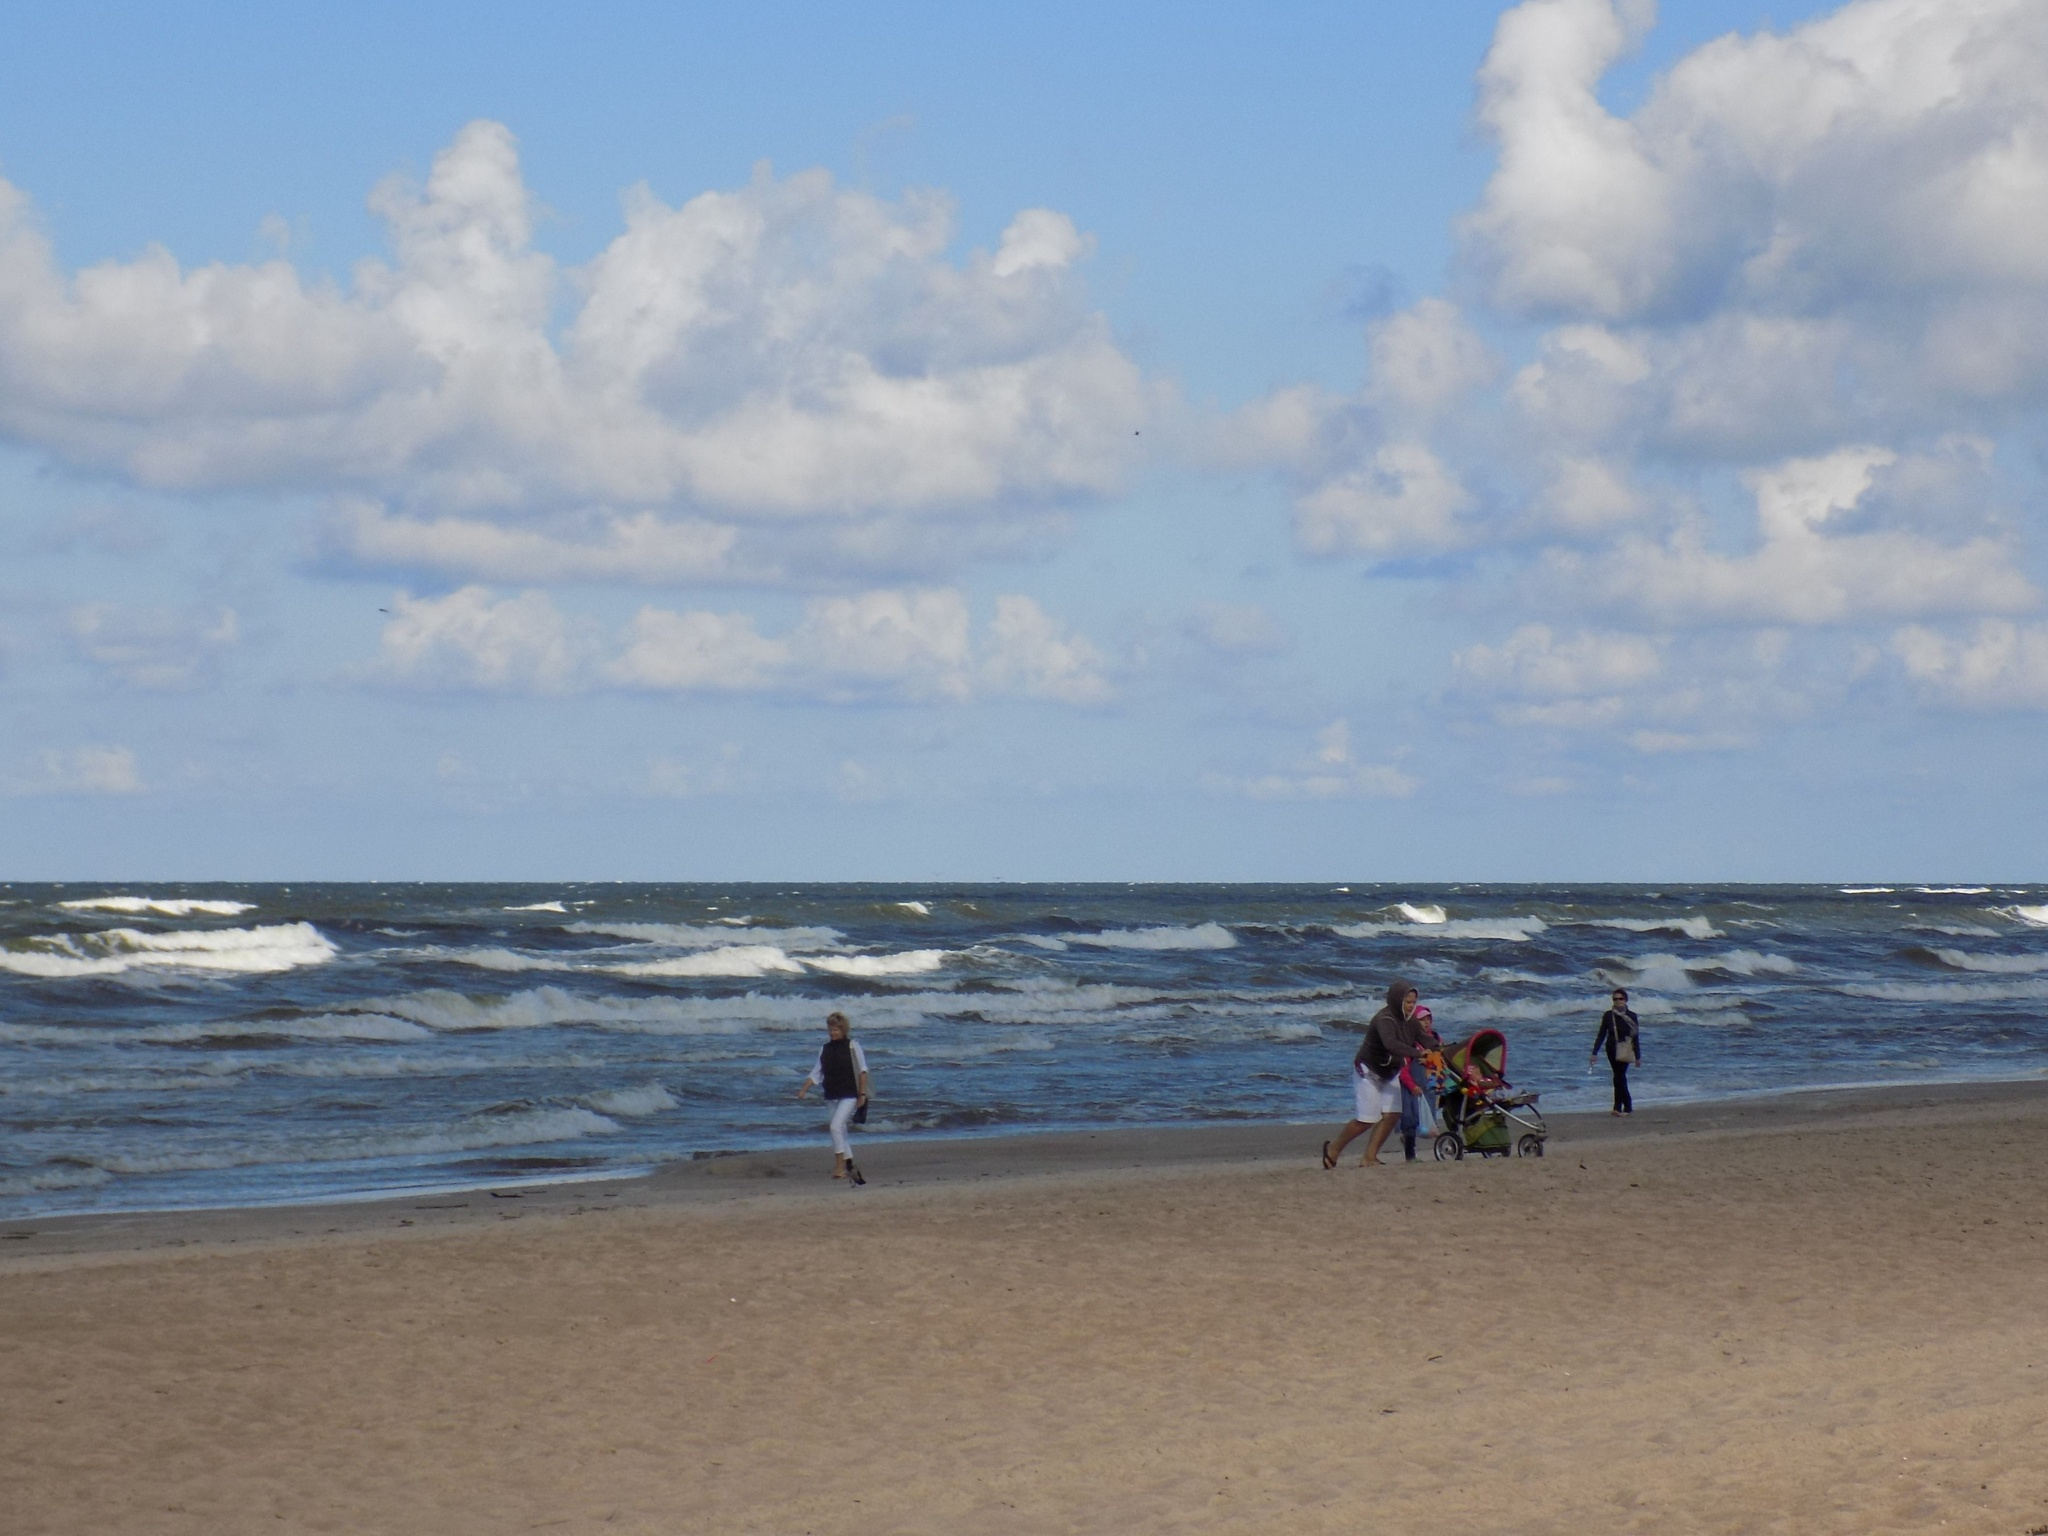 By the sea by uzkuraitiene62